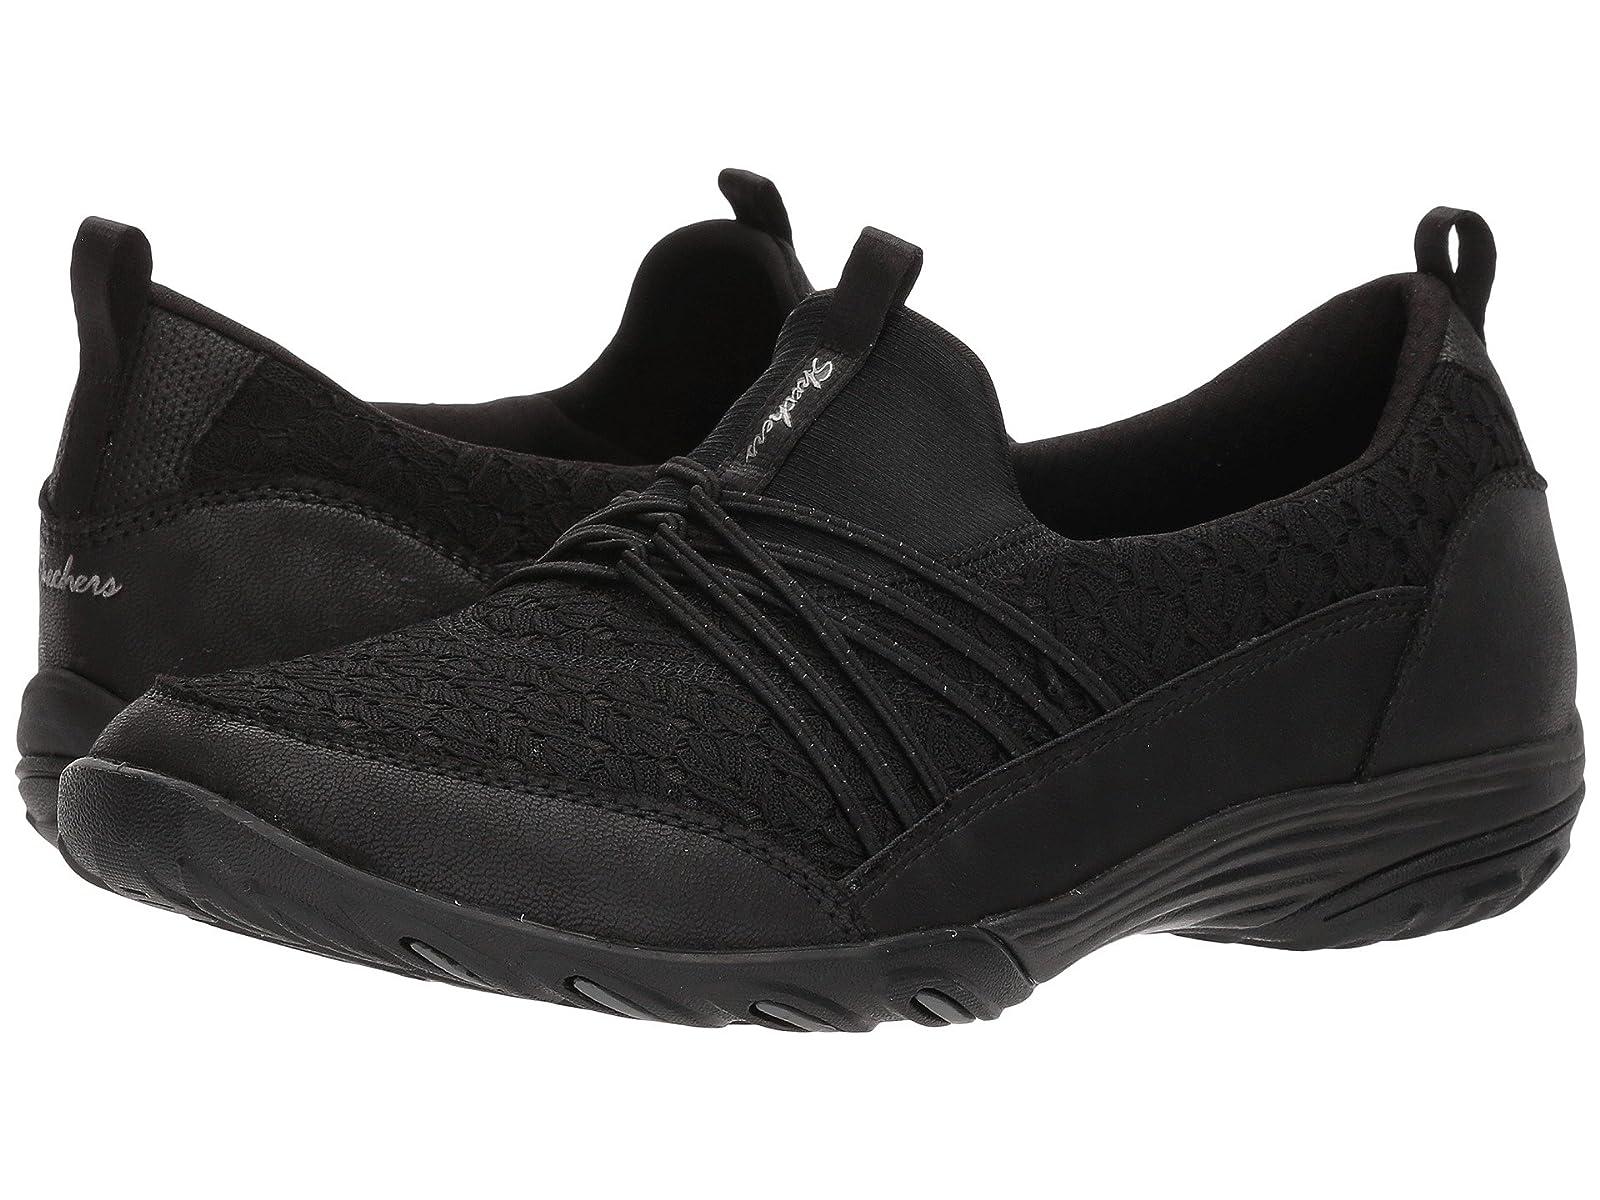 SKECHERS Empress - Wide-AwakeAtmospheric grades have affordable shoes